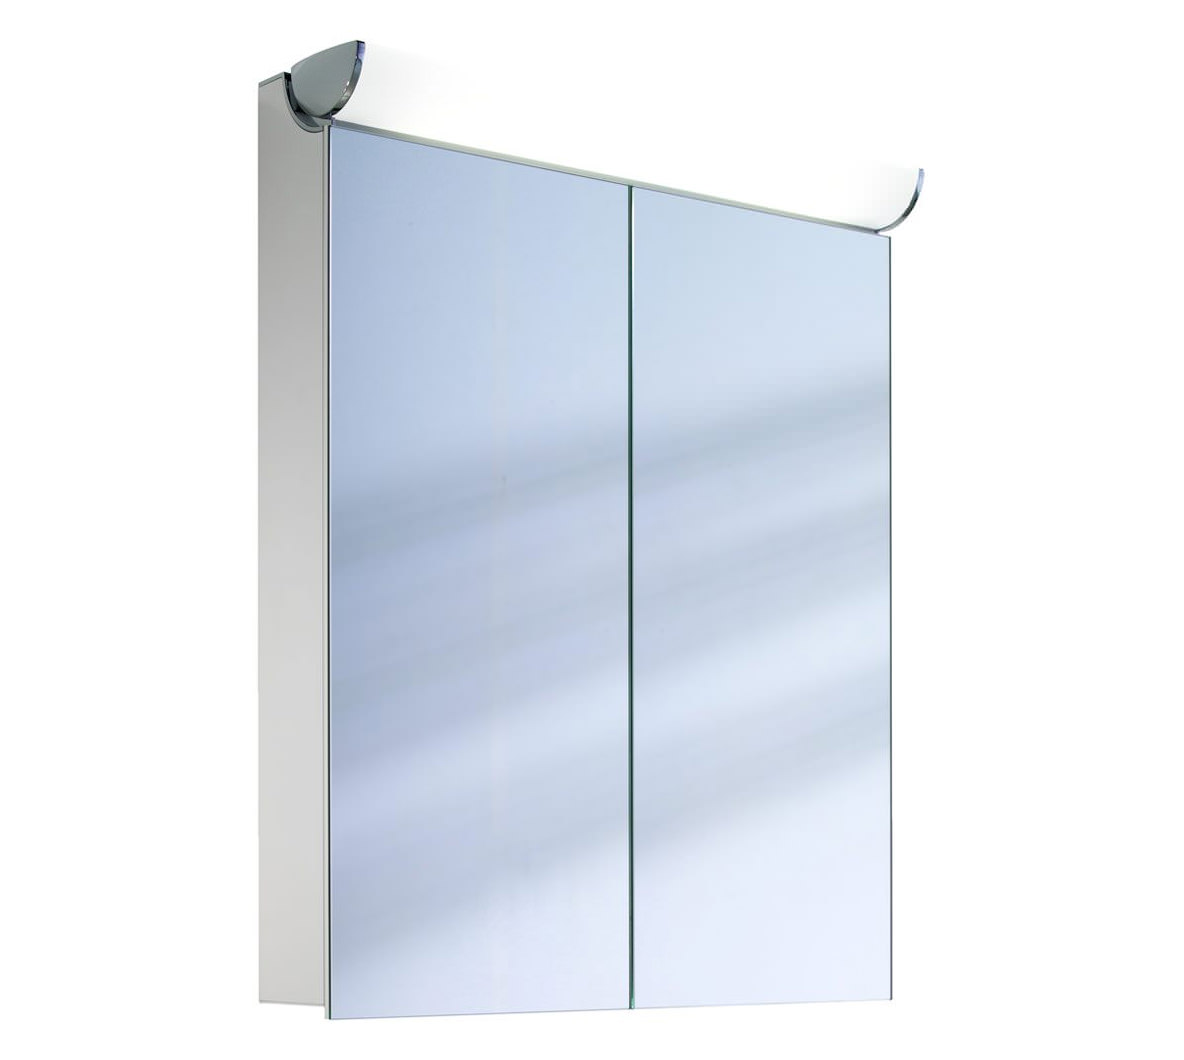 Schneider faceline 2 door illuminated mirror cabinet 700mm for Bathroom cabinets 700mm